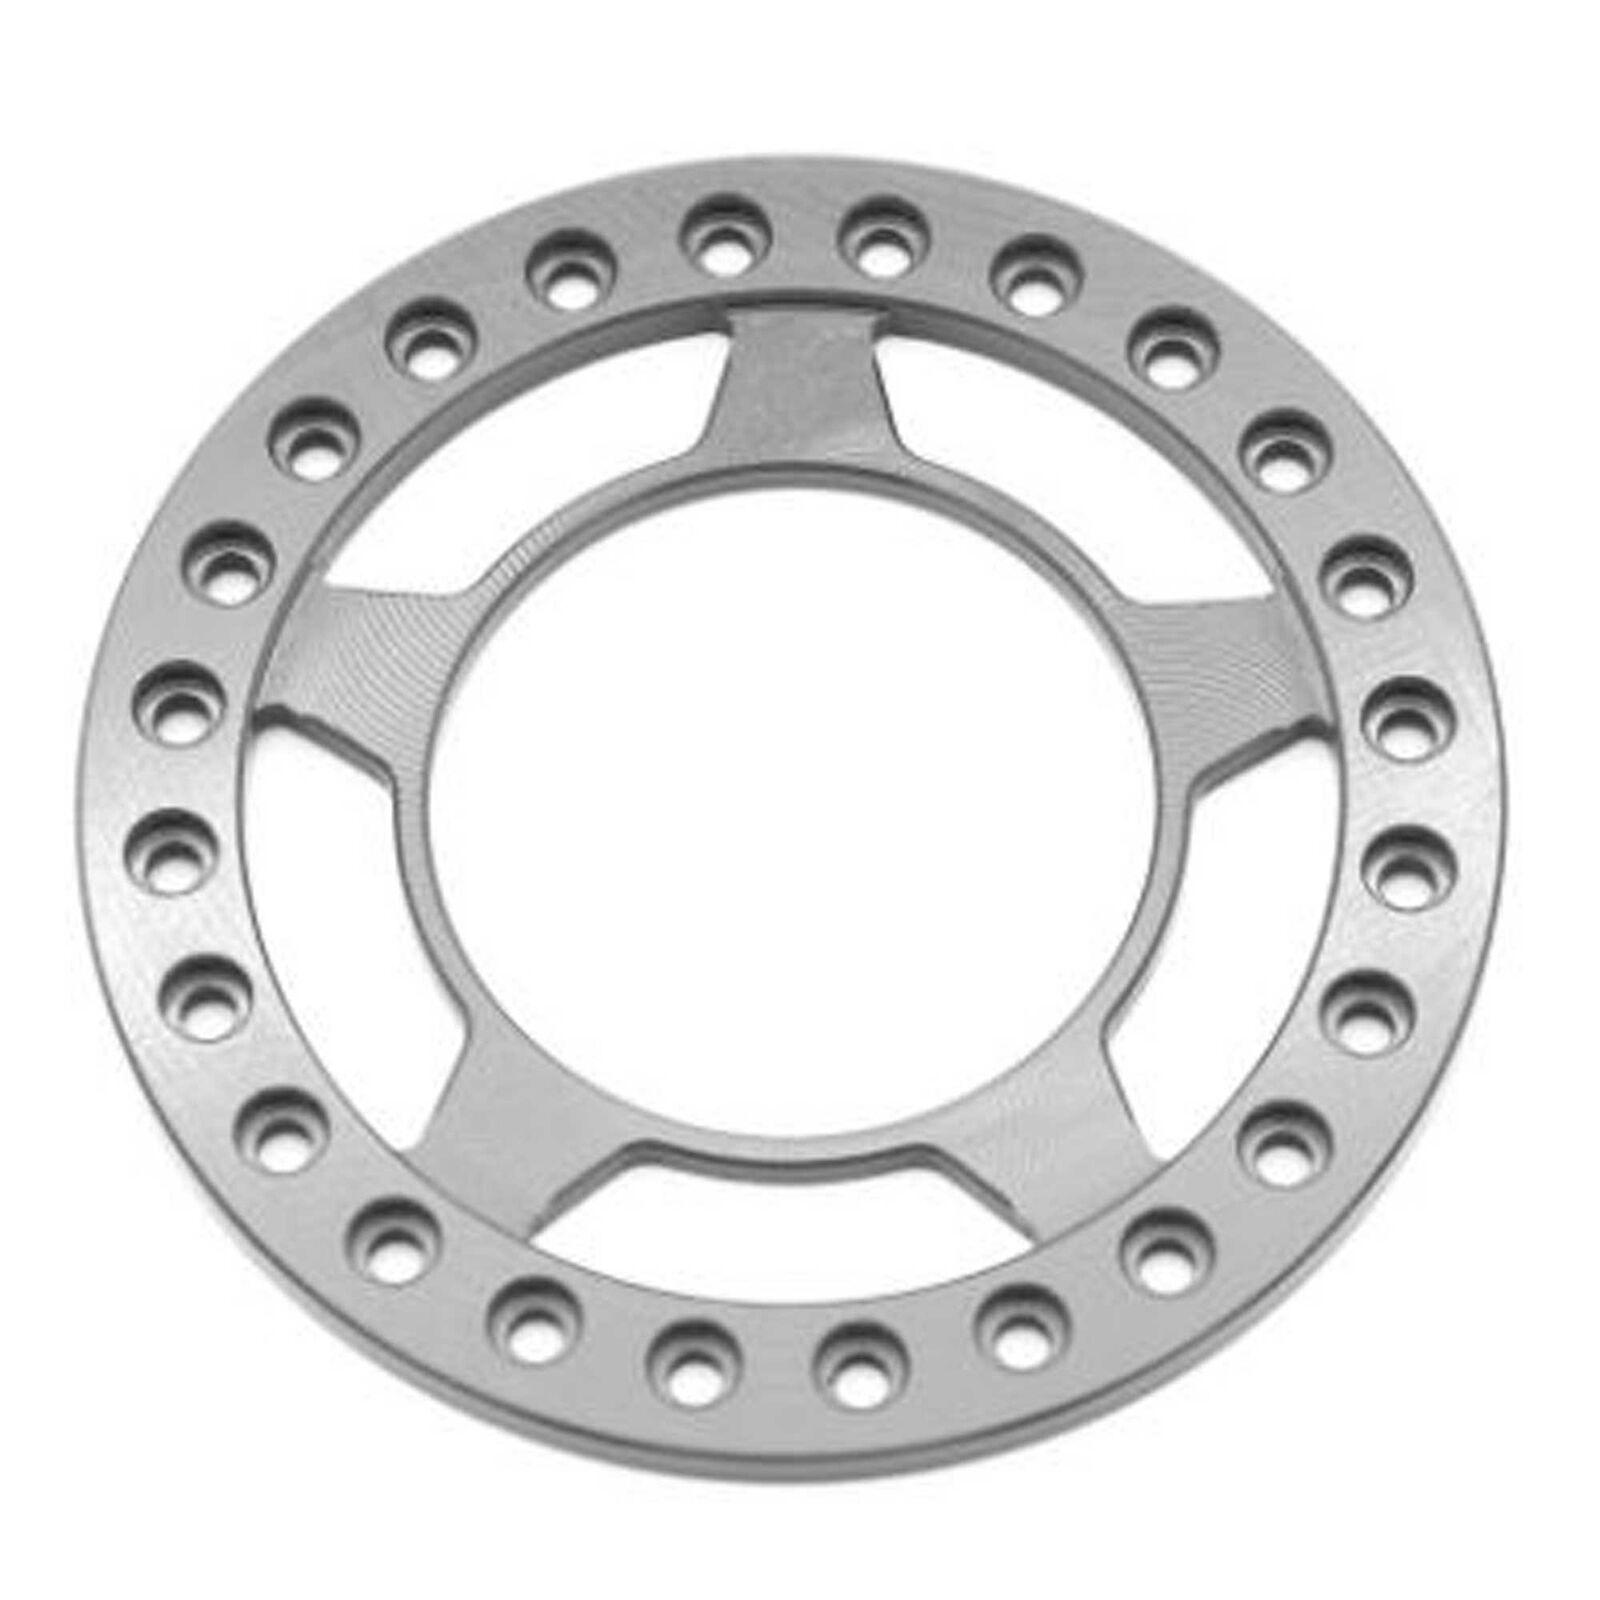 1.9 Spyder Beadlock Grey Anodized